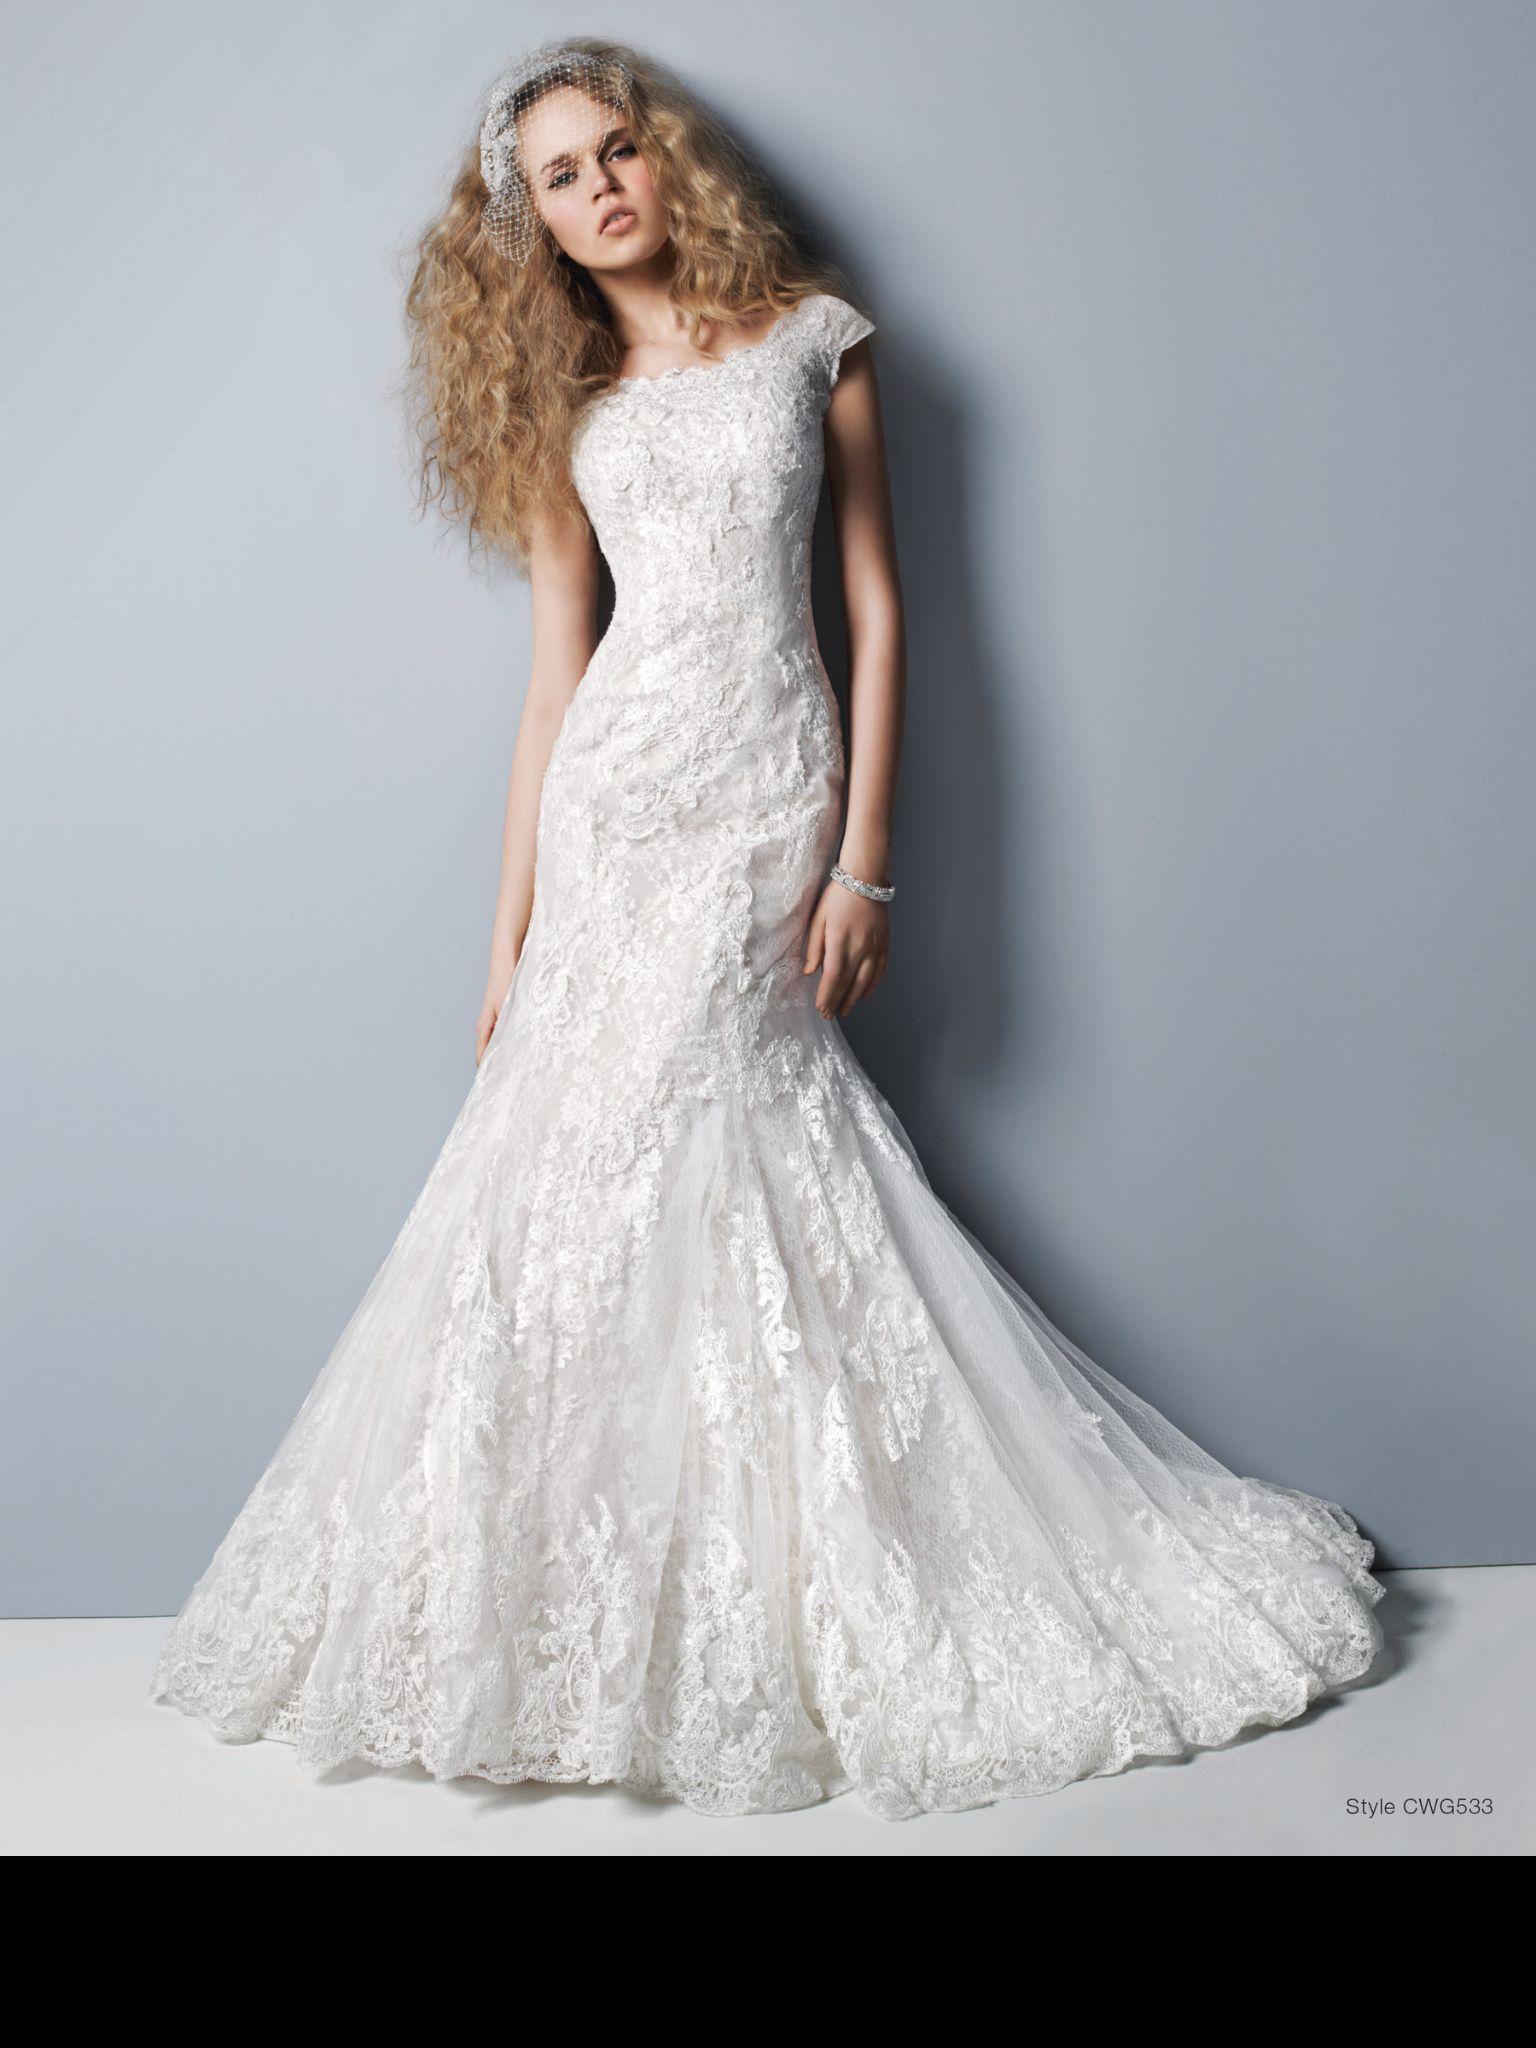 Lace wedding dress | Vintage Wedding | Pinterest | Modest wedding ...